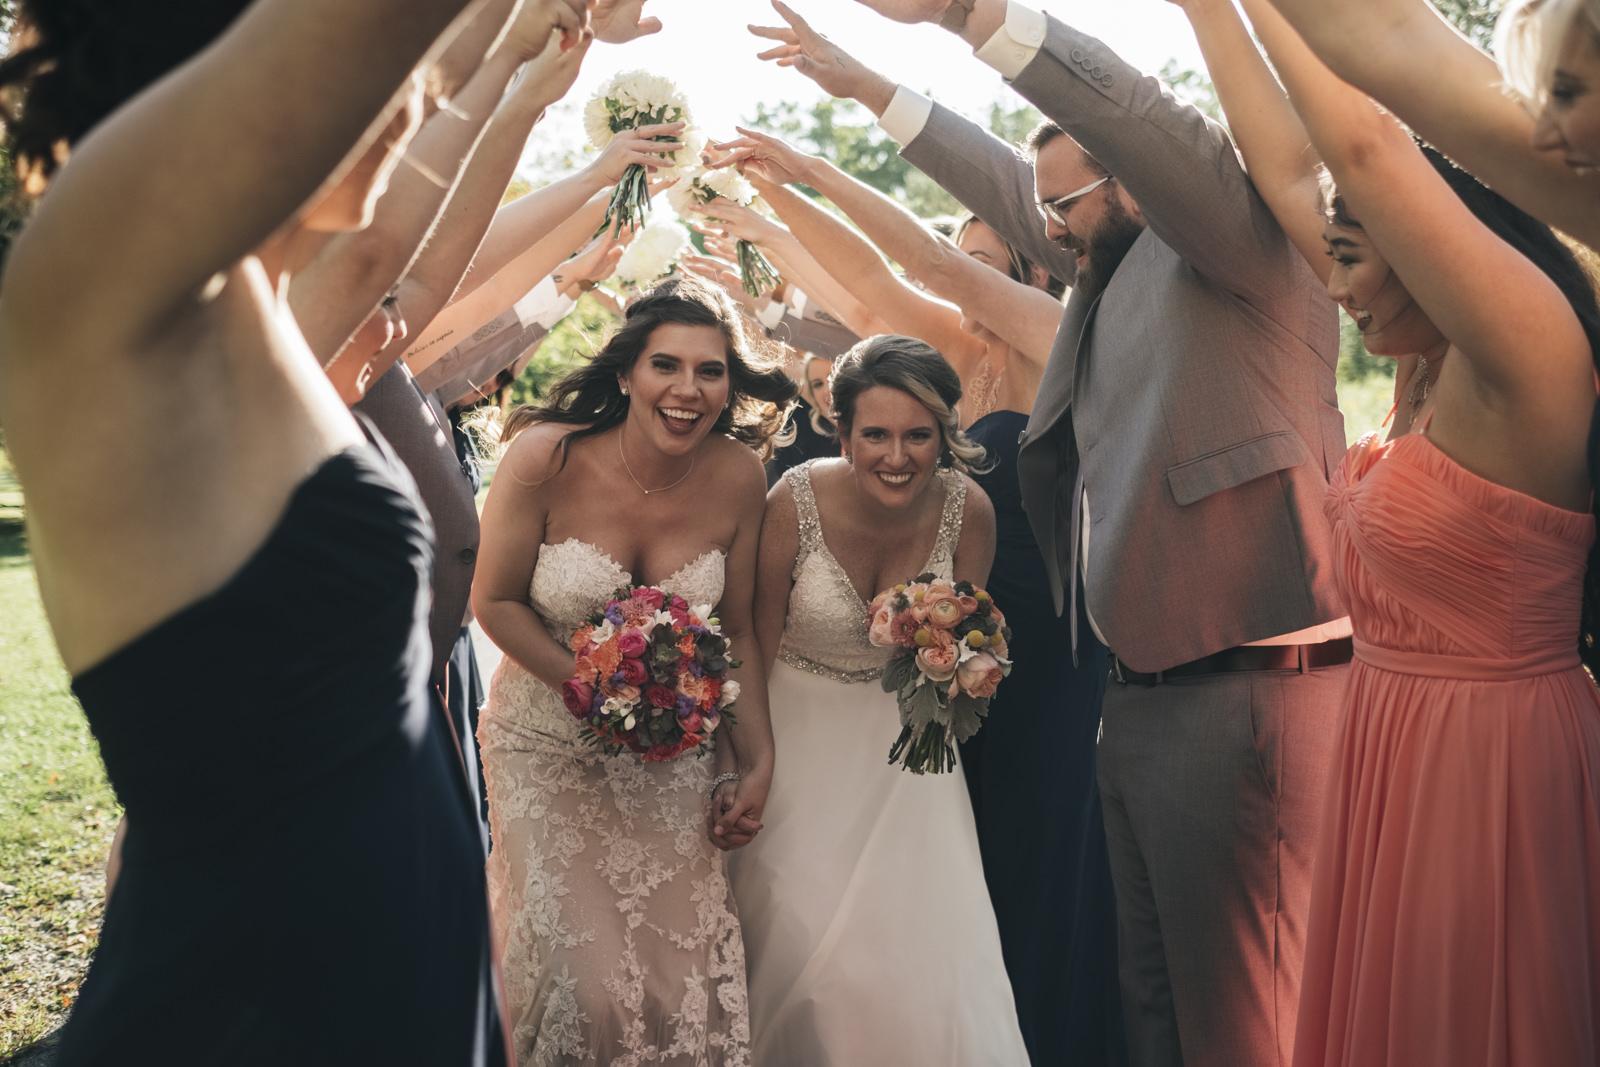 Brides run through a tunnel of their bridal party.